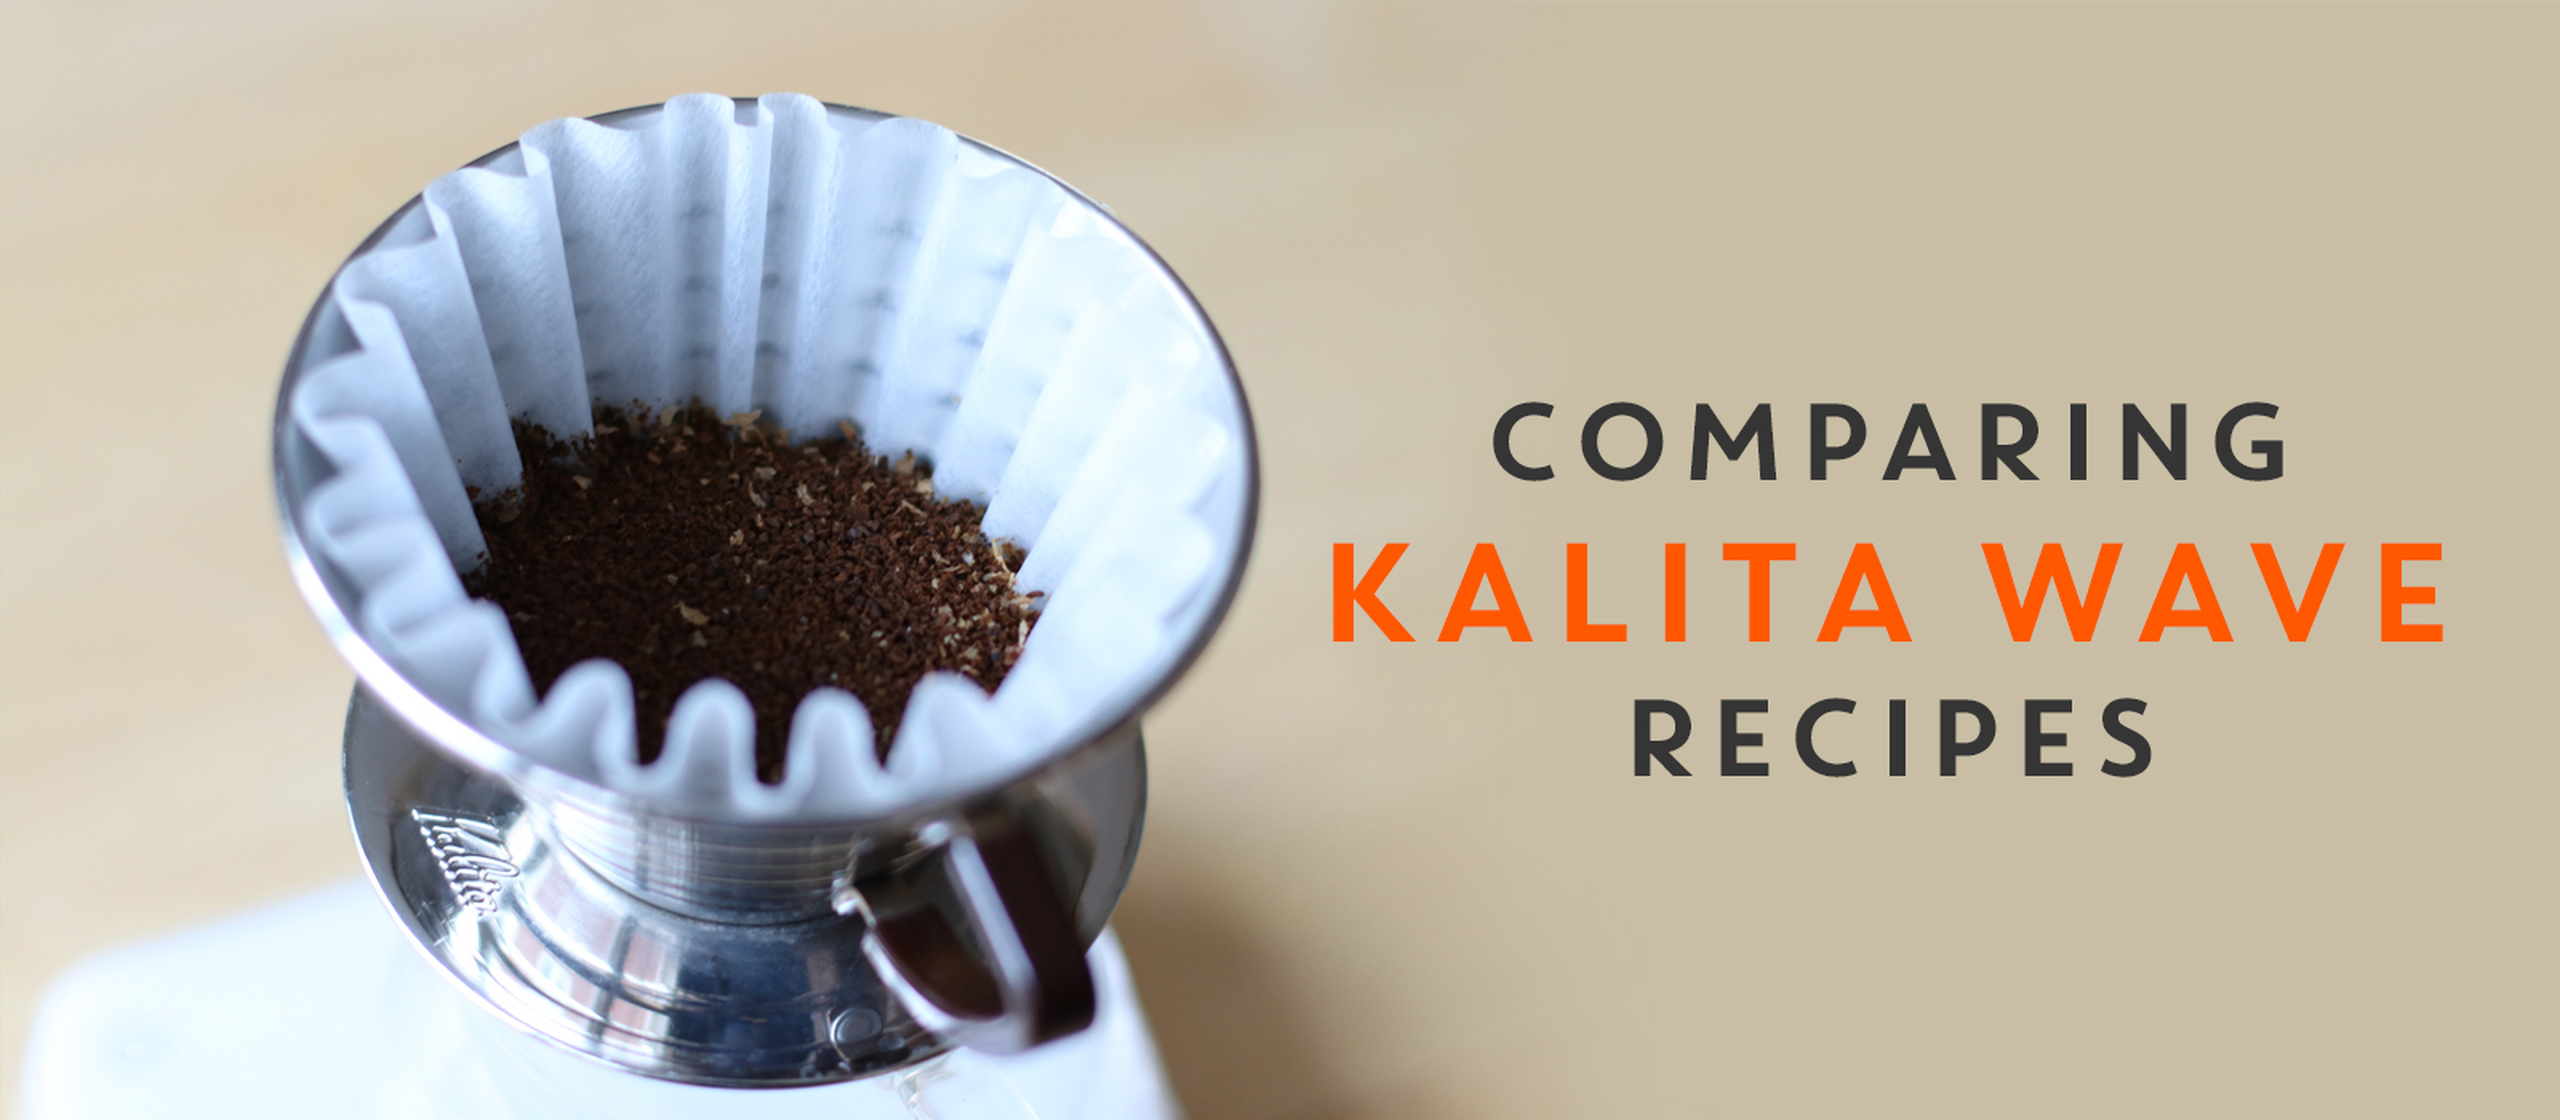 Comparing Kalita Wave Recipes